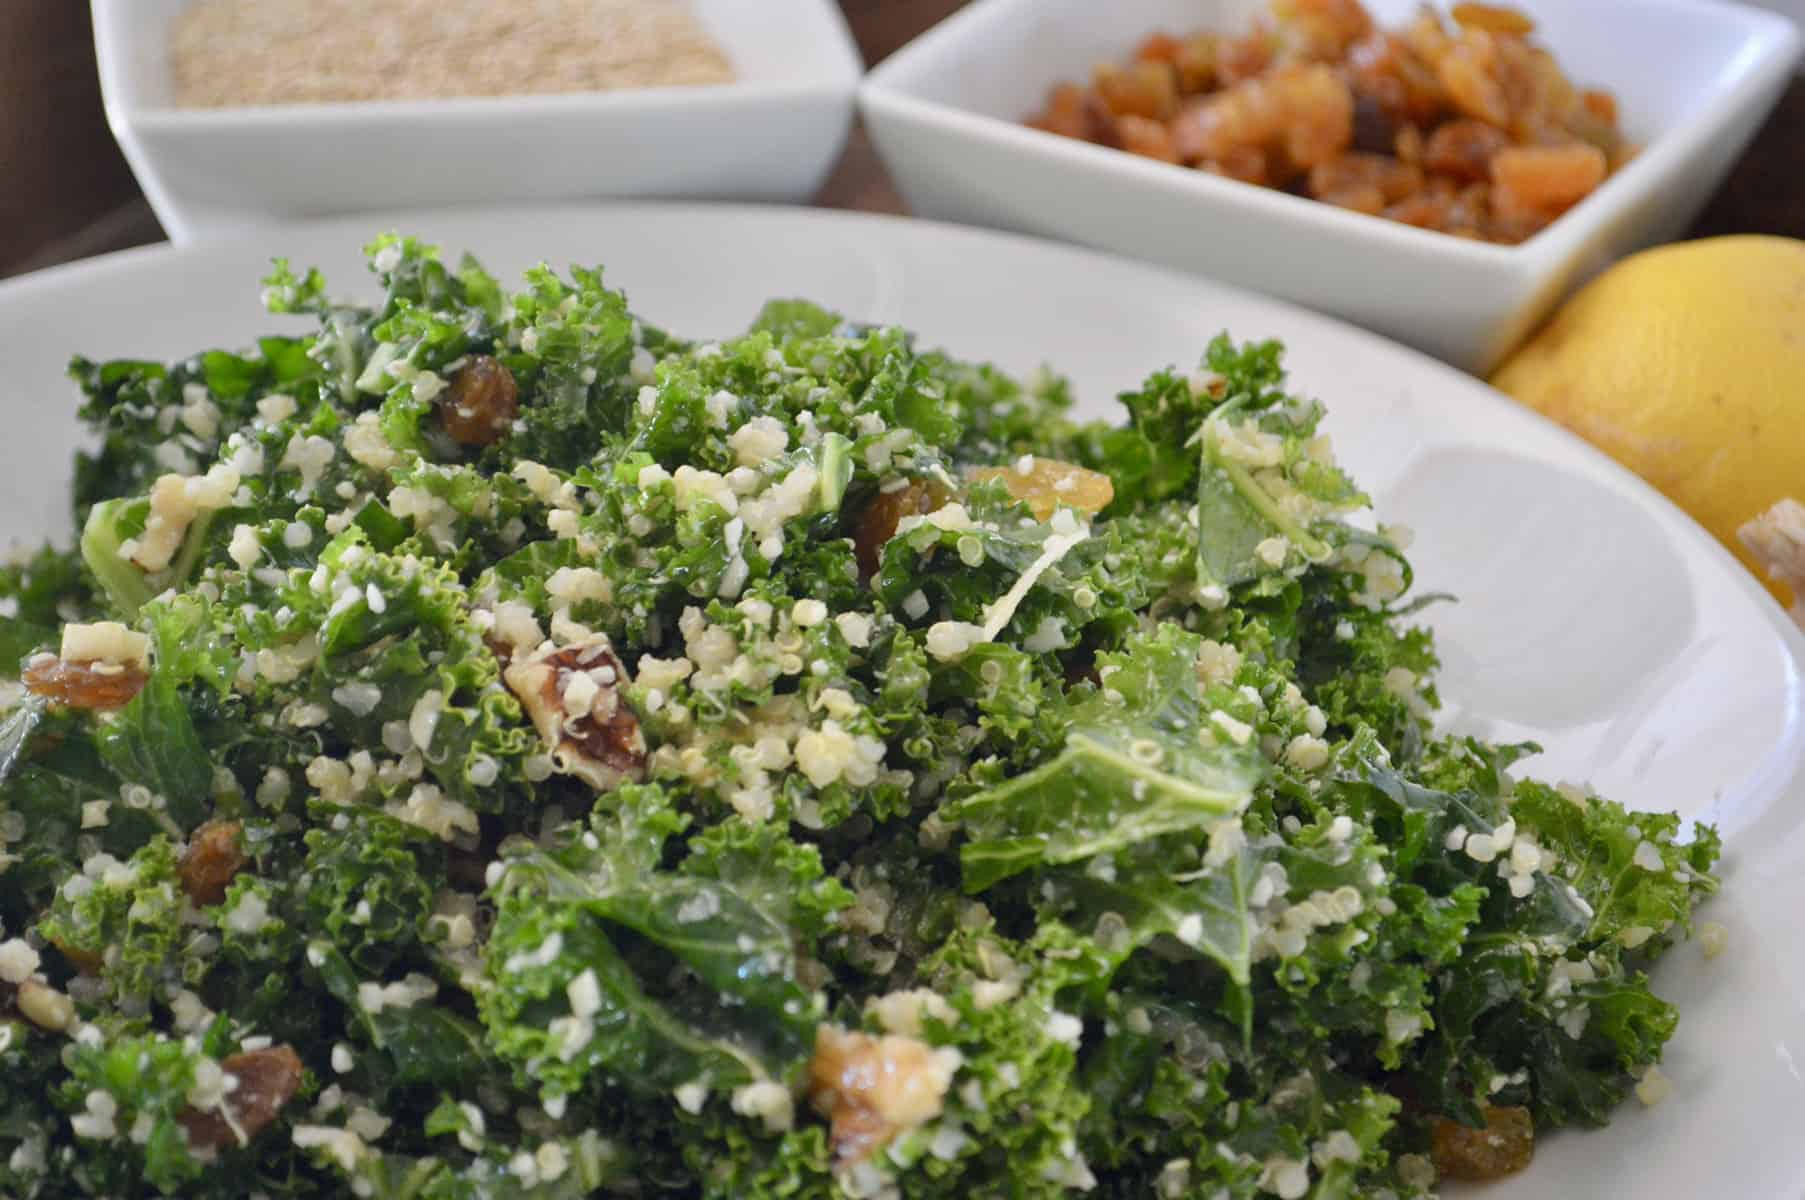 Kale Quinoa Salad with golden raisins and lemon for a baby shower menu